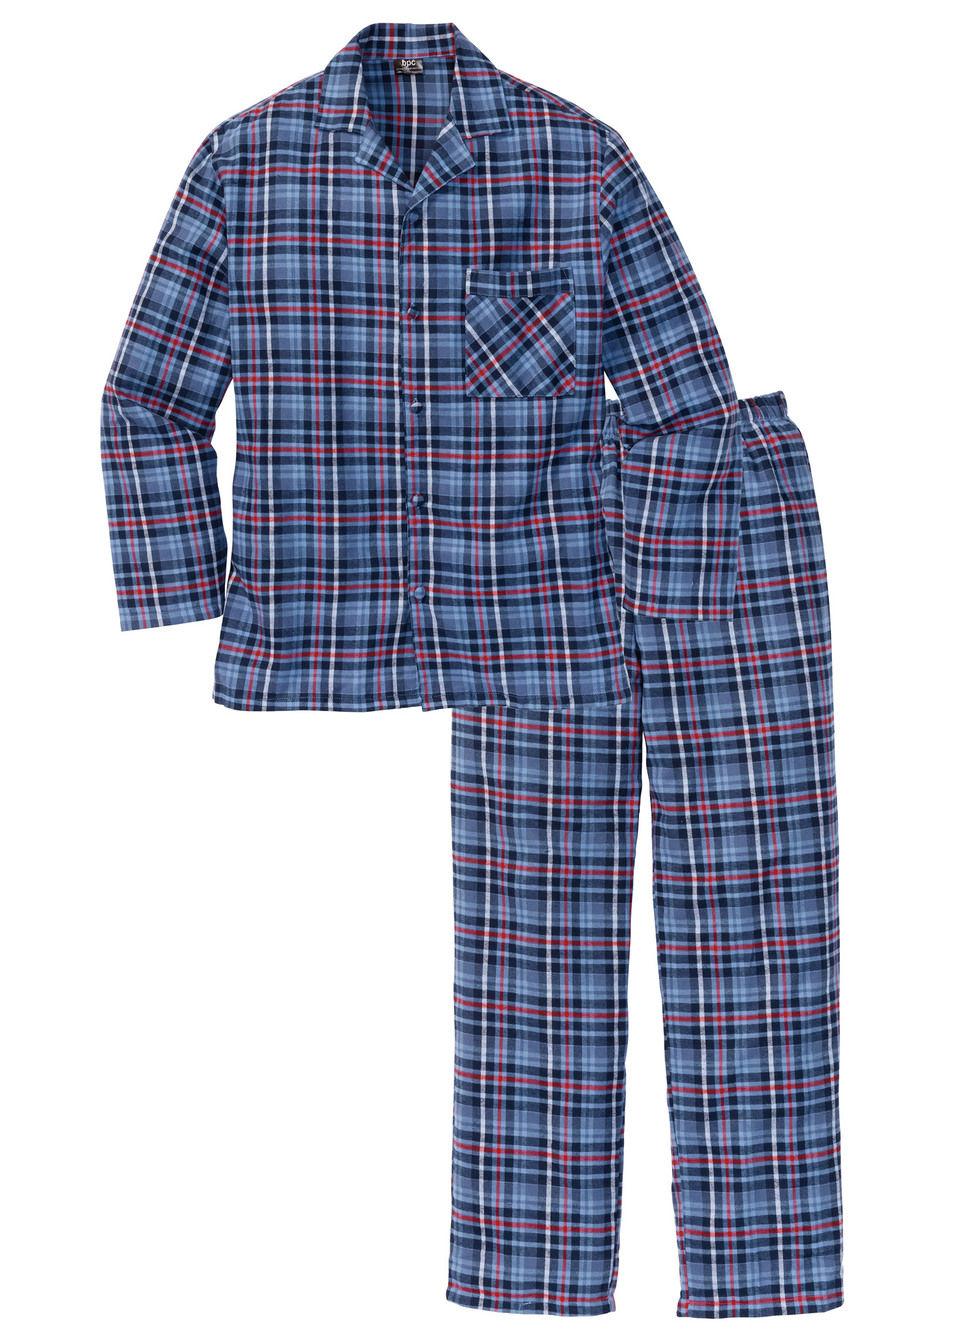 Фланелевая пижама свободного покроя